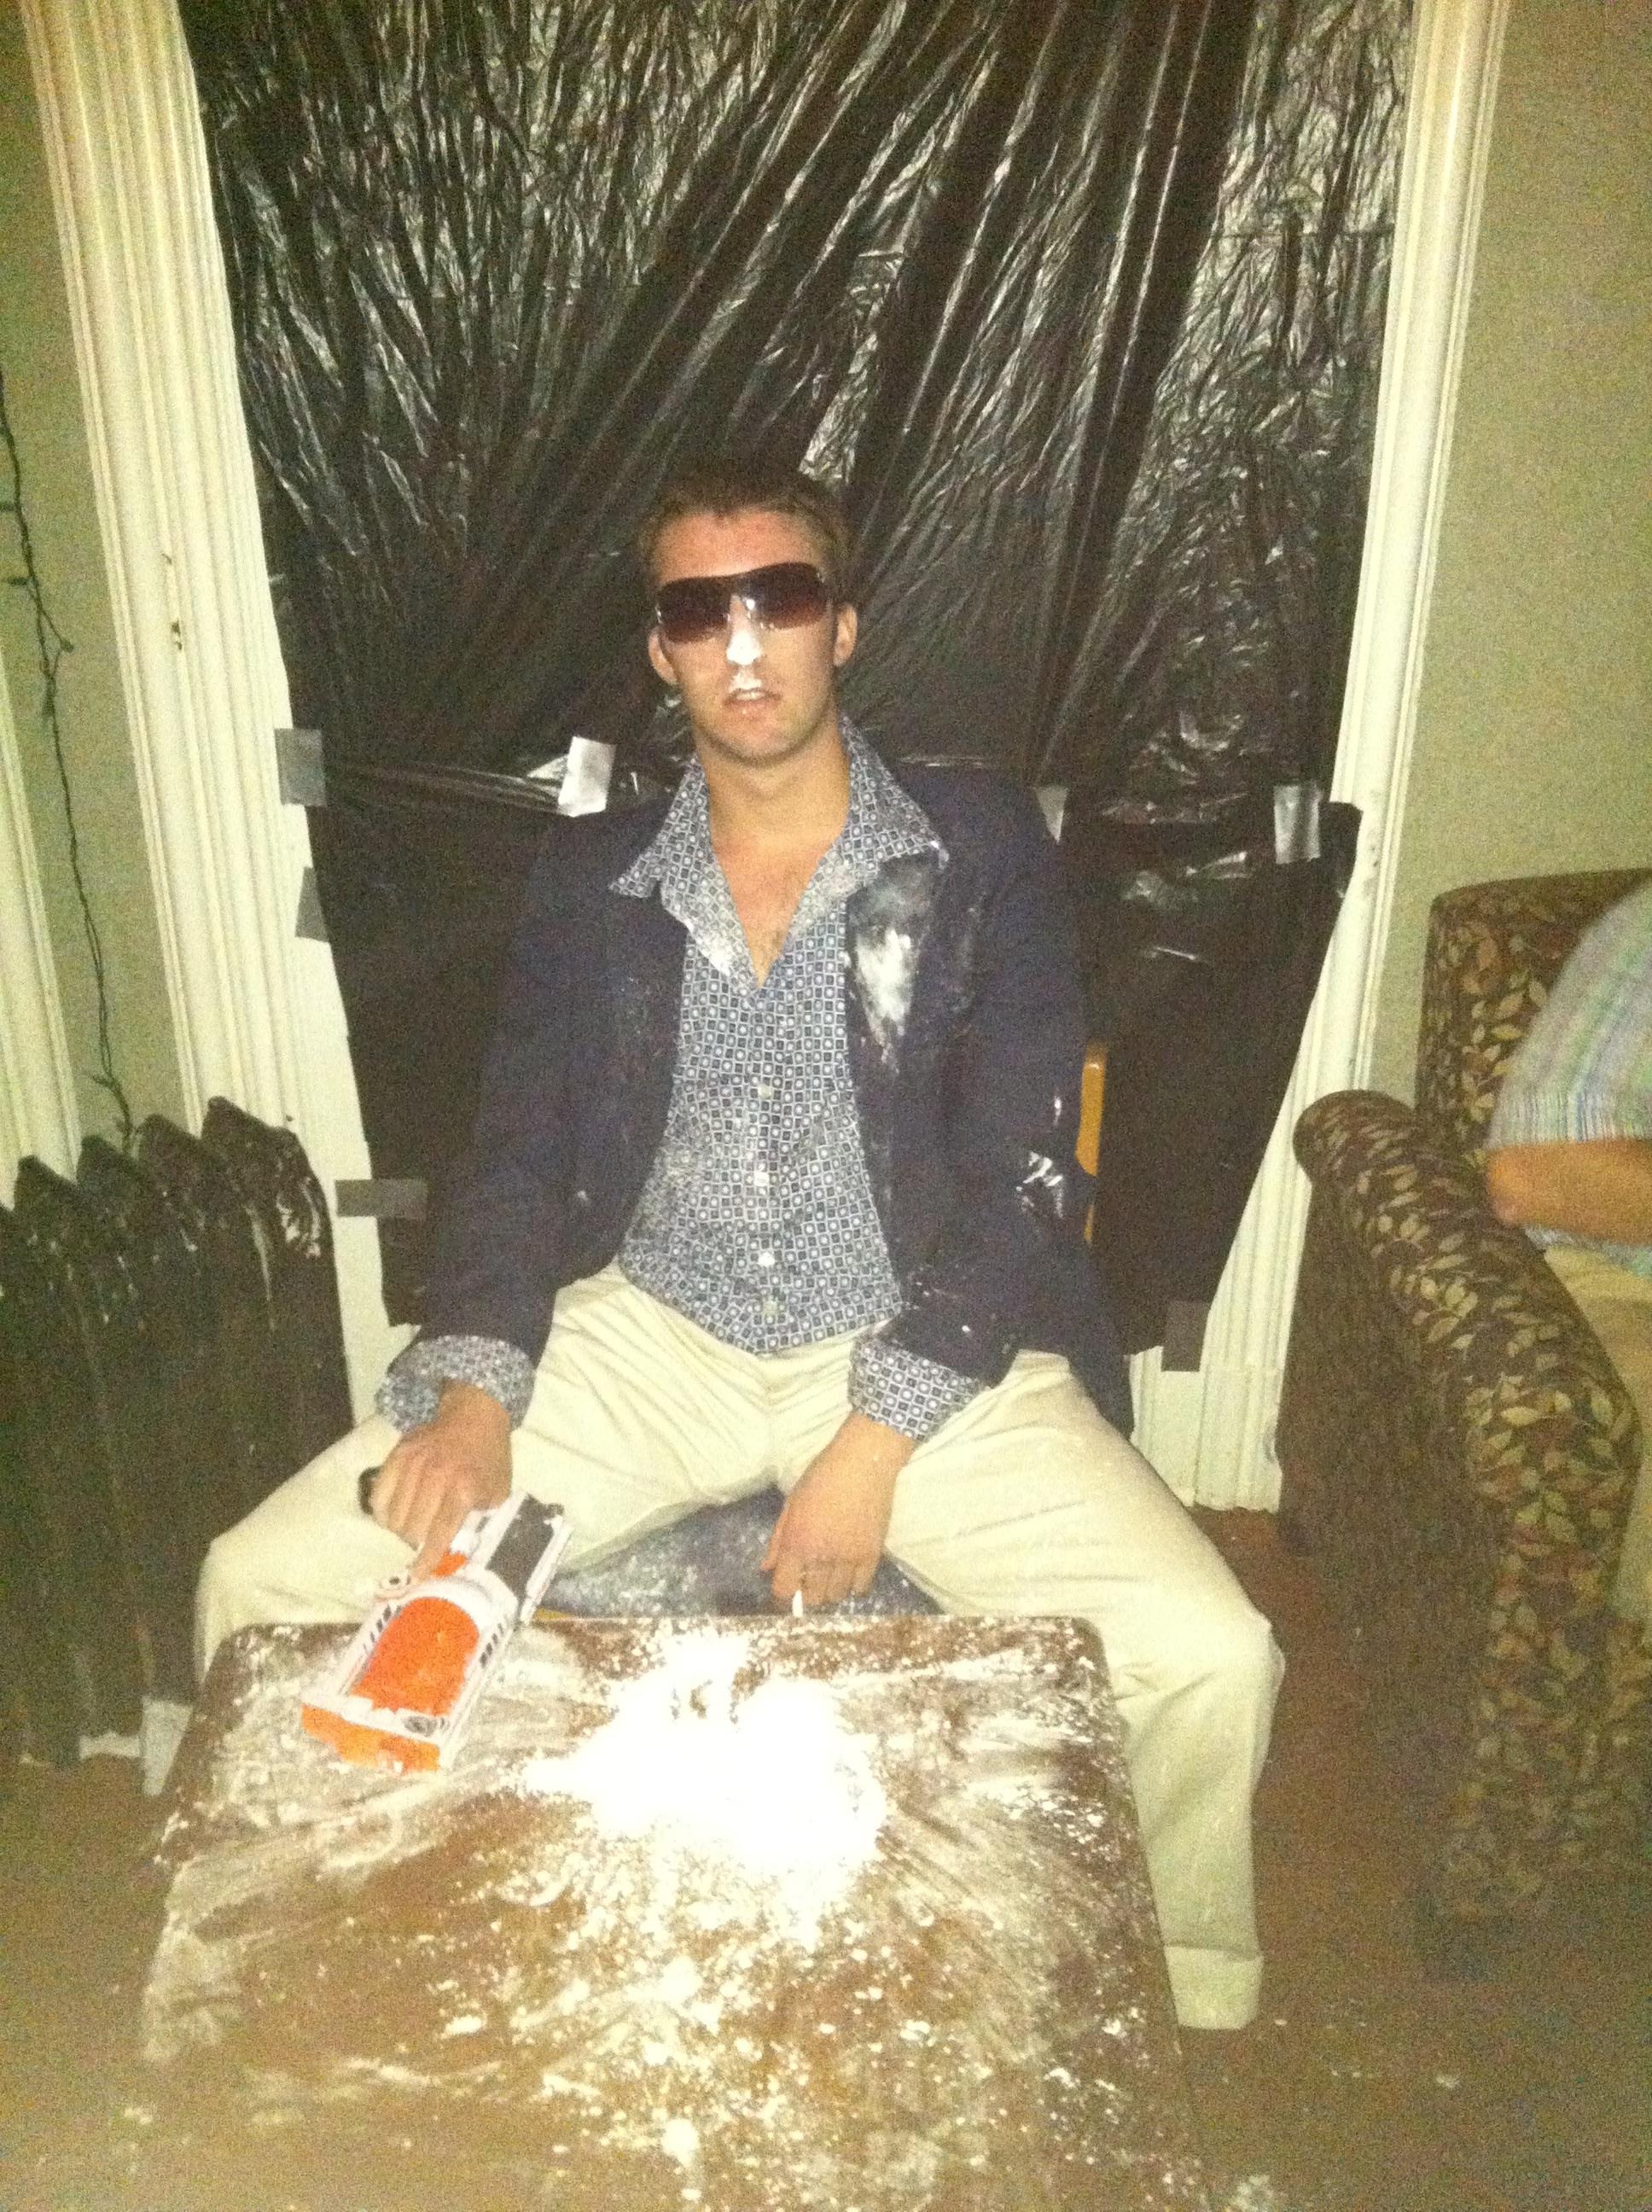 Tony Montana AKA Scarface. & Total Frat Move | Top 30 Halloween Costumes Of 2012